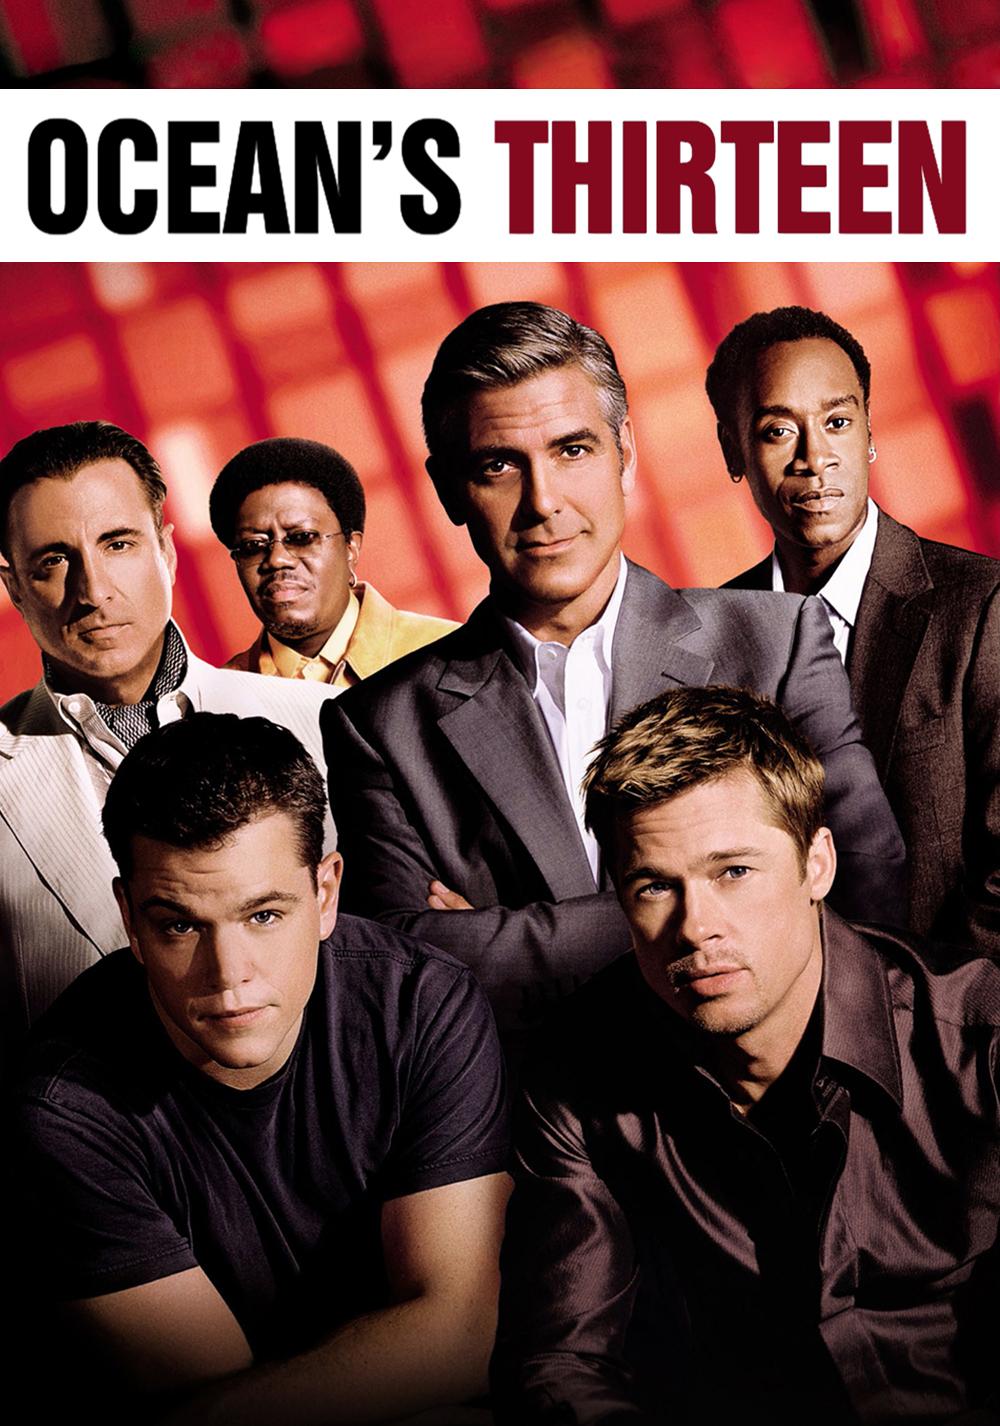 Ocean's thirteen movie poster wallpaper